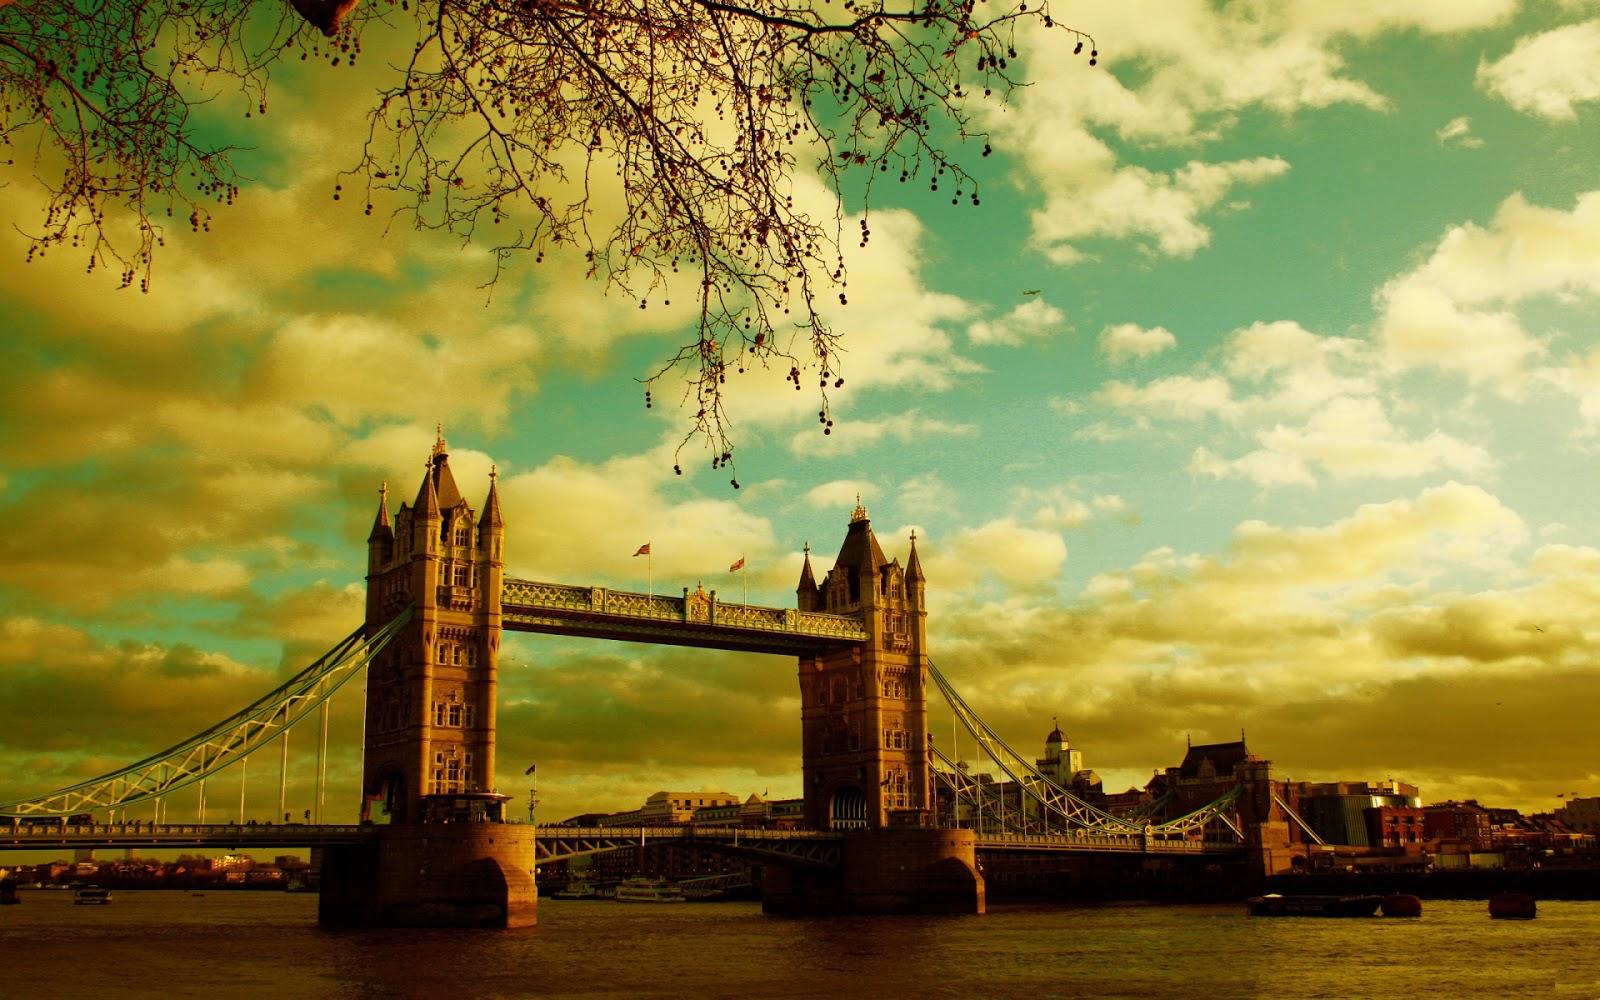 Free Download Wallpaper HD : tower bridge of london hq full hd wallpapers free download 2013